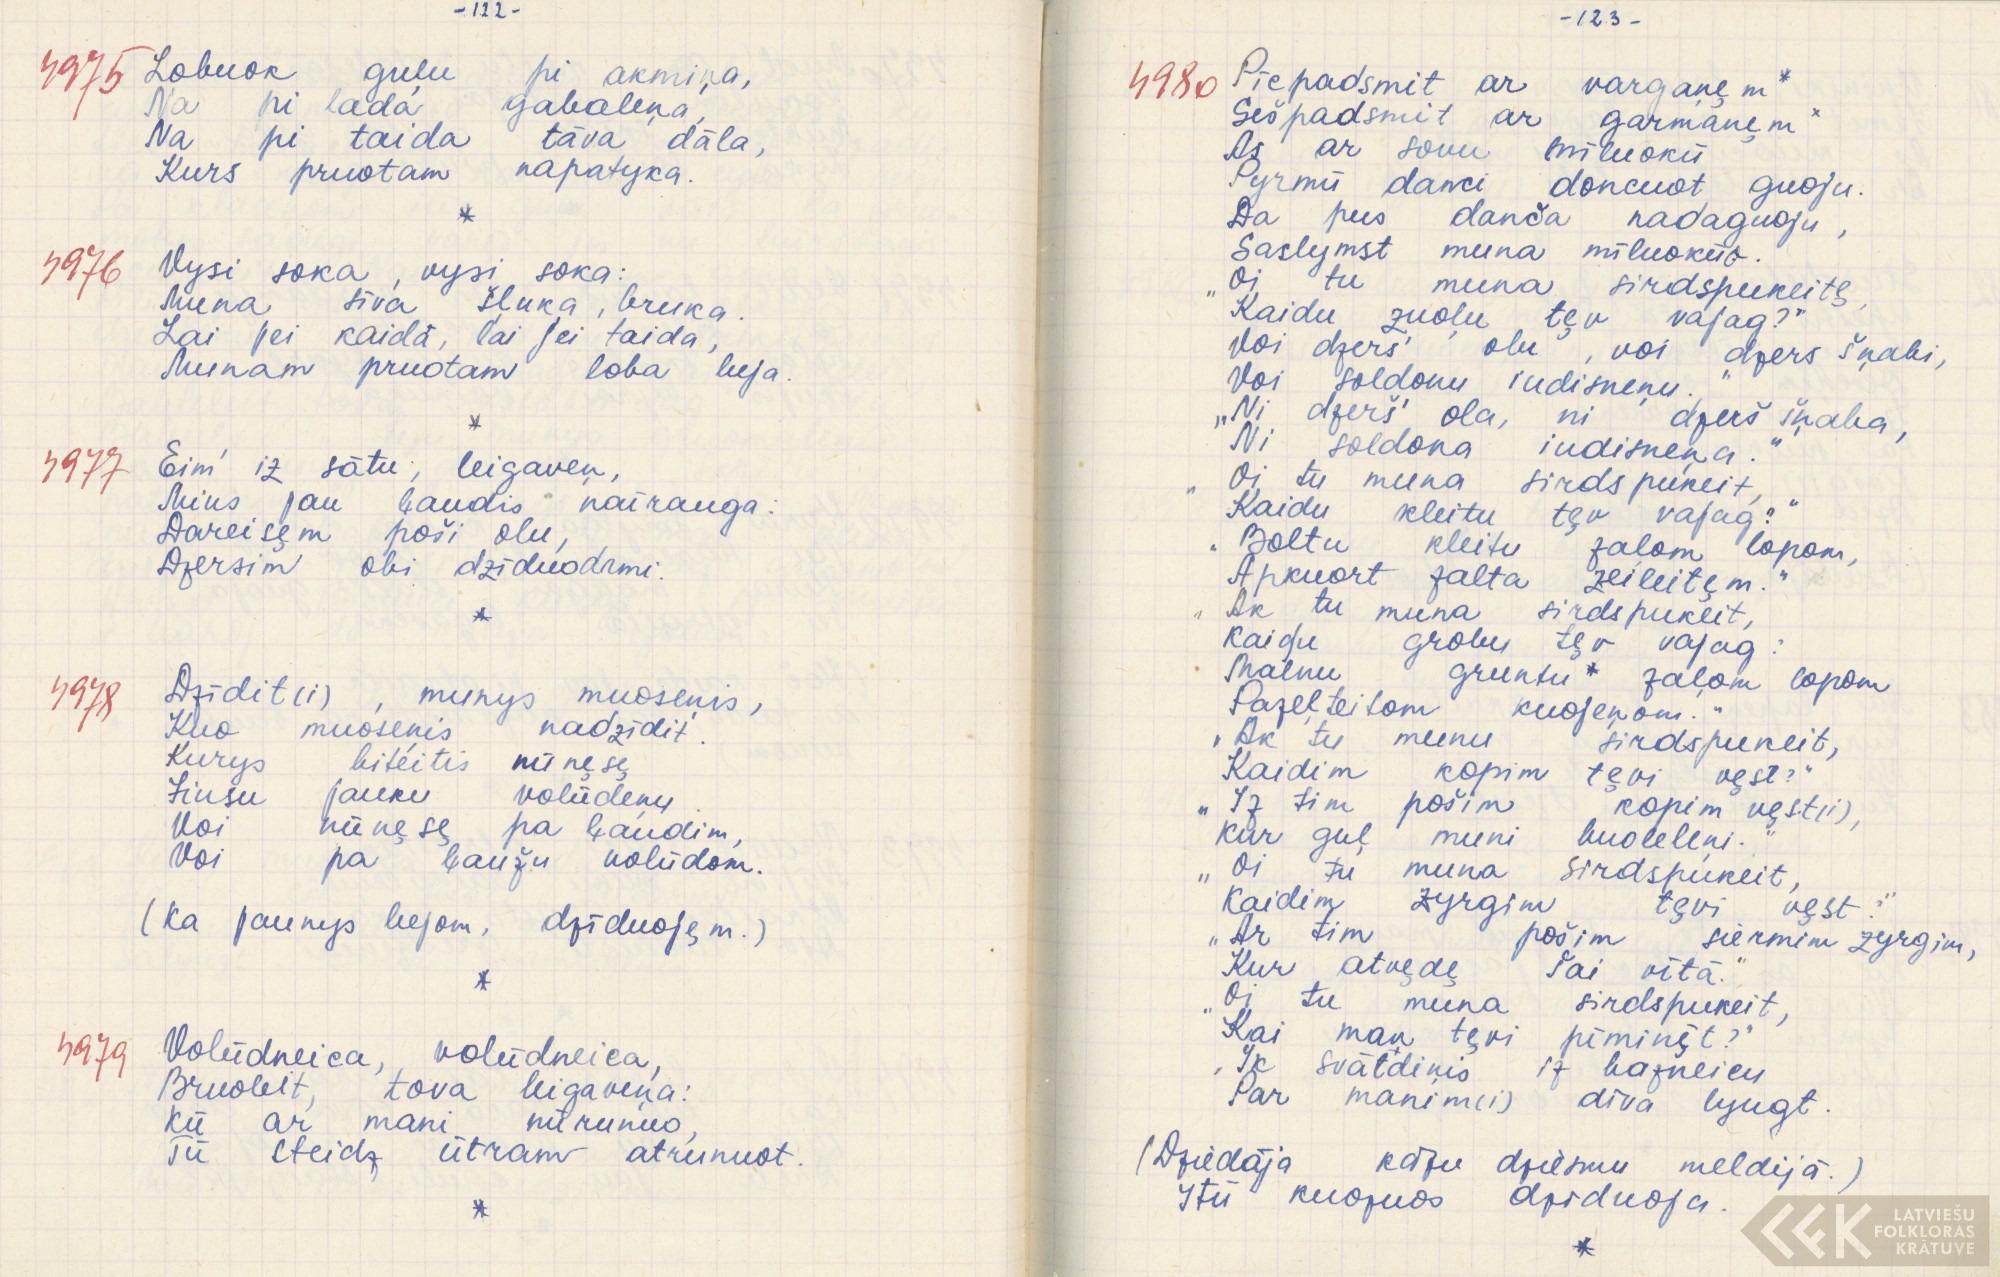 1950-14-zinatniska-ekspedicija-13-0067